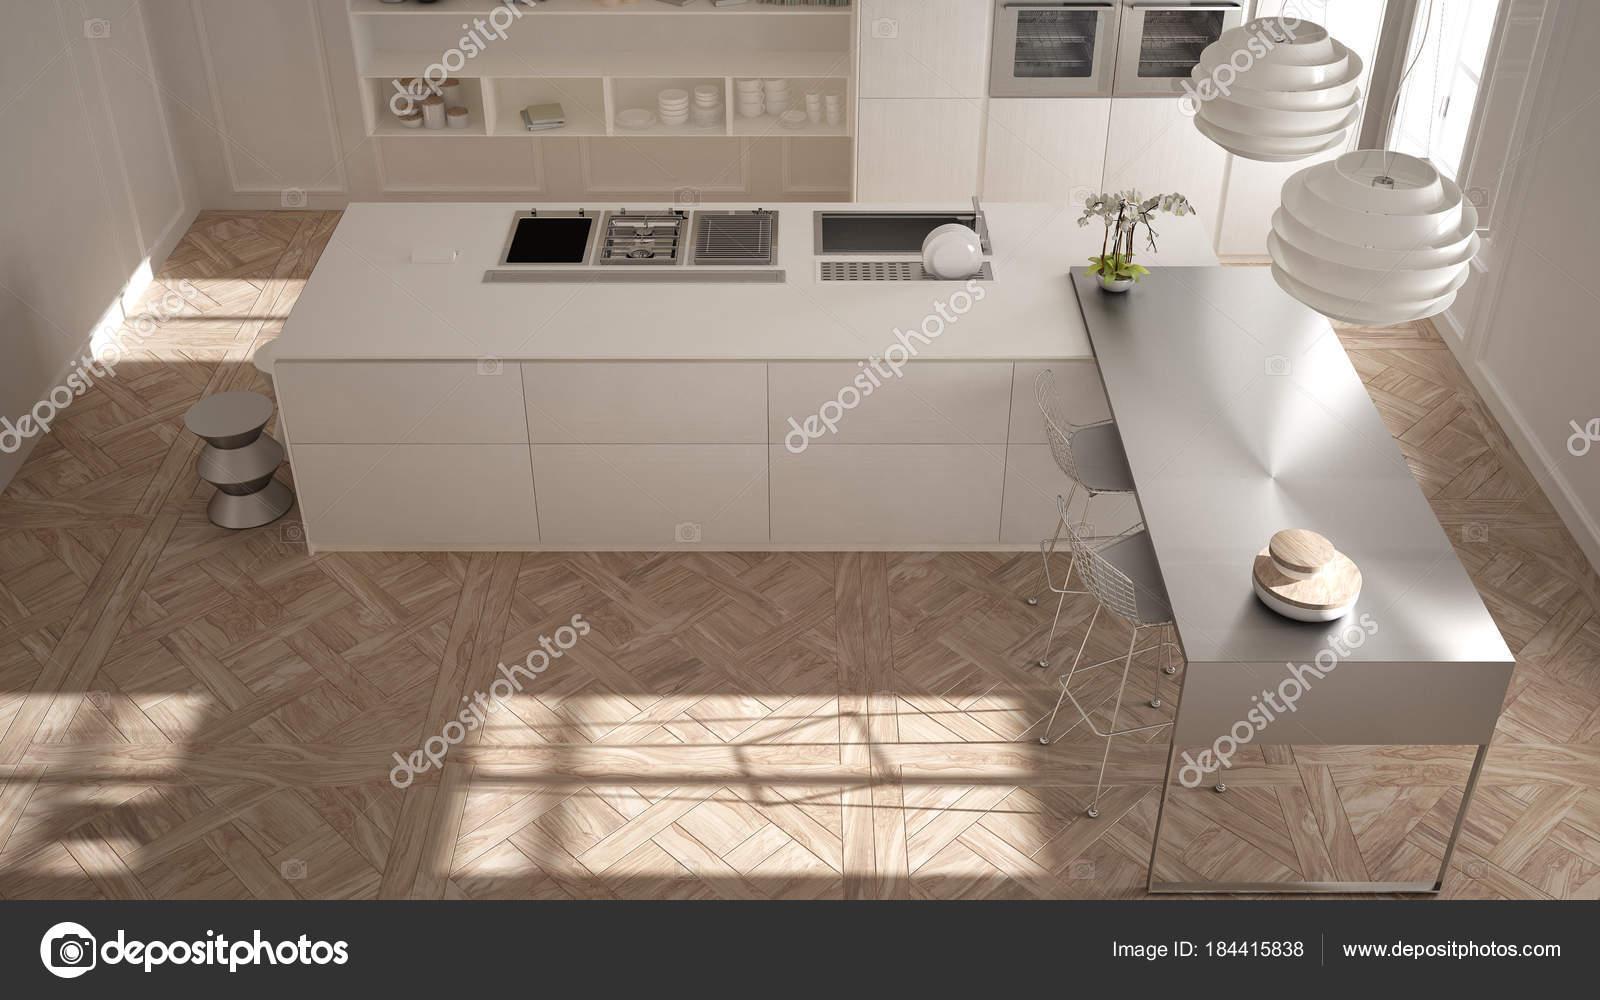 Sgabelli Cucina Classici : Cucina moderna in interni classici isola con sgabelli e due